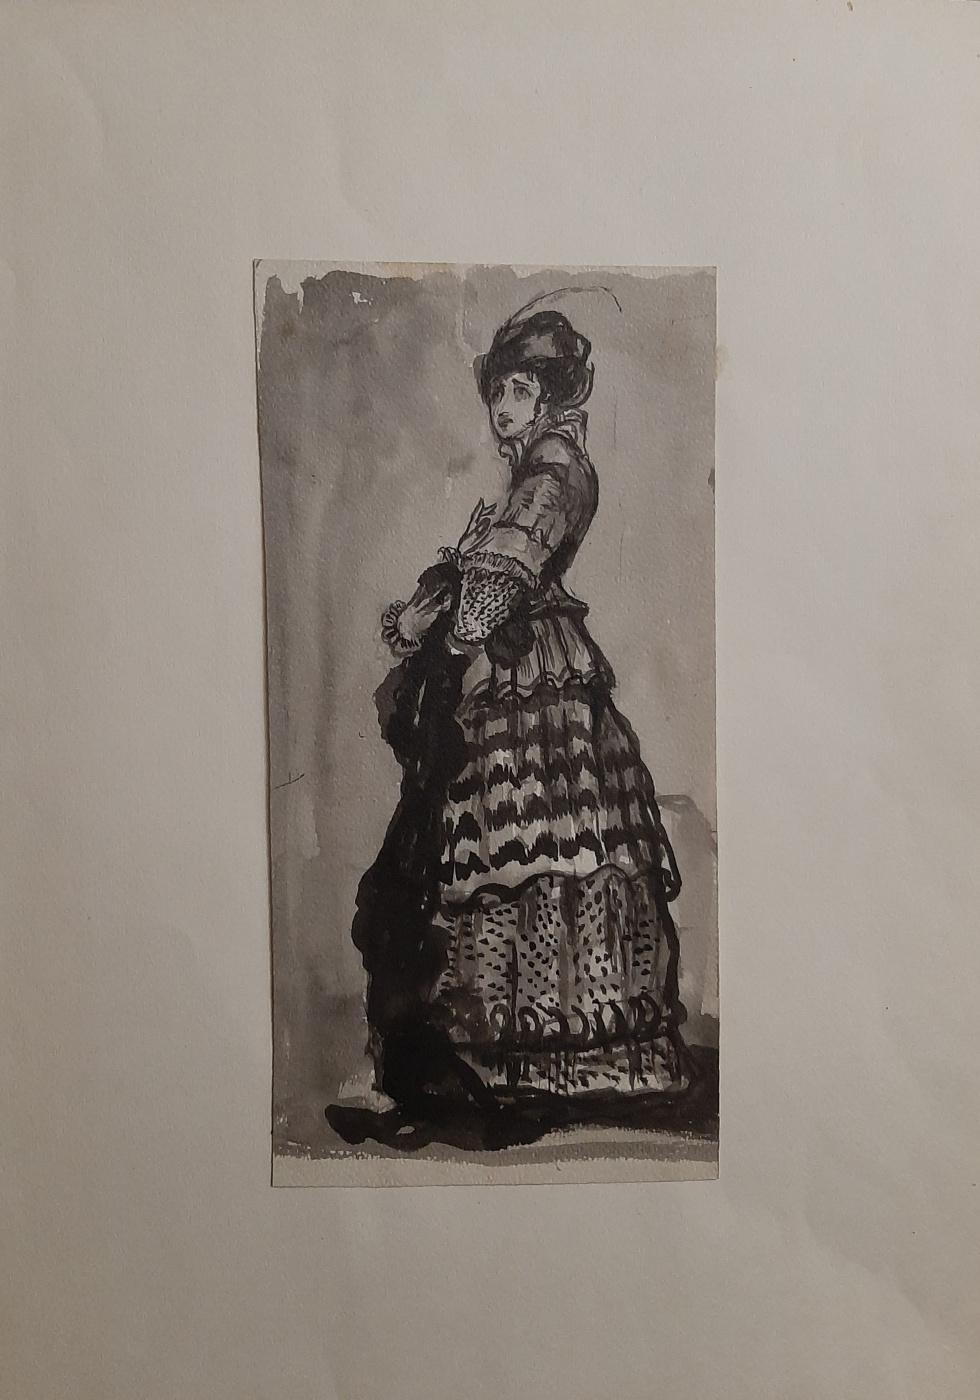 Natalia Agapieva - Zakharova. Portrait of a woman in a dress of the 19th century